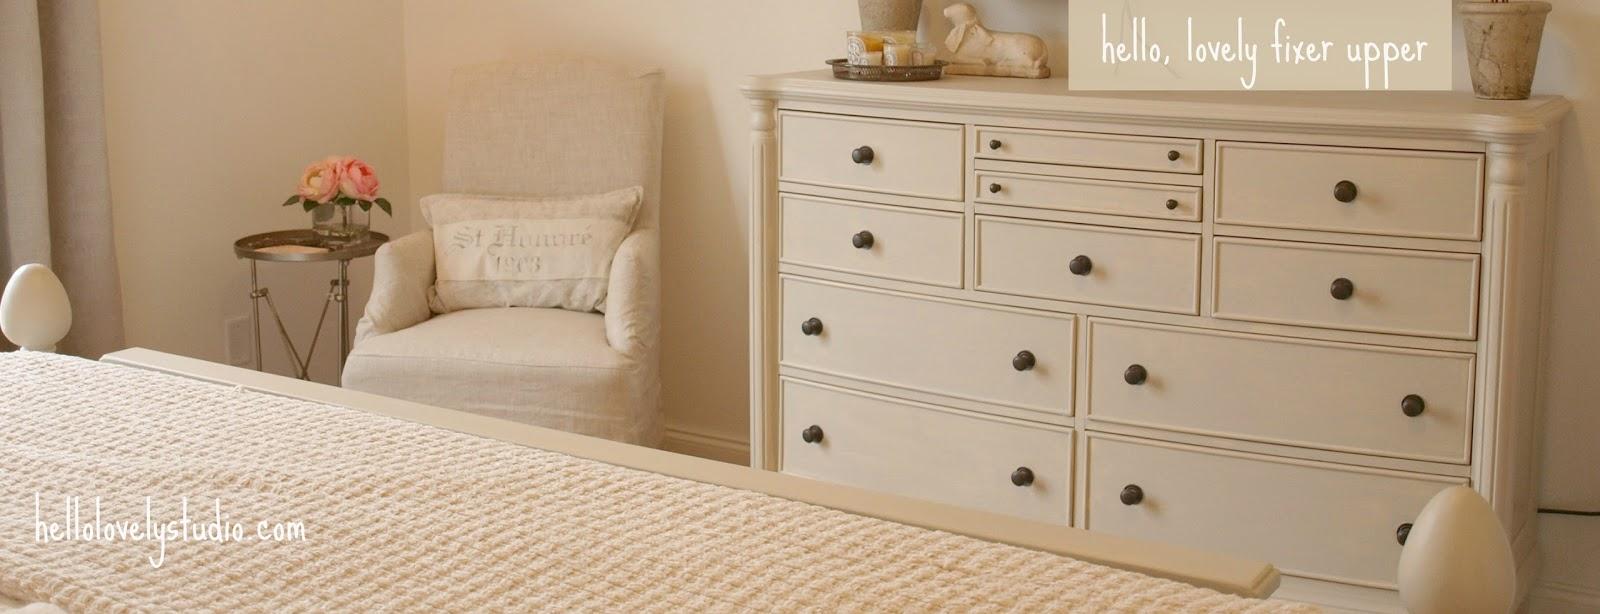 Cottage style bedroom in fixer upper - Hello Lovely Studio